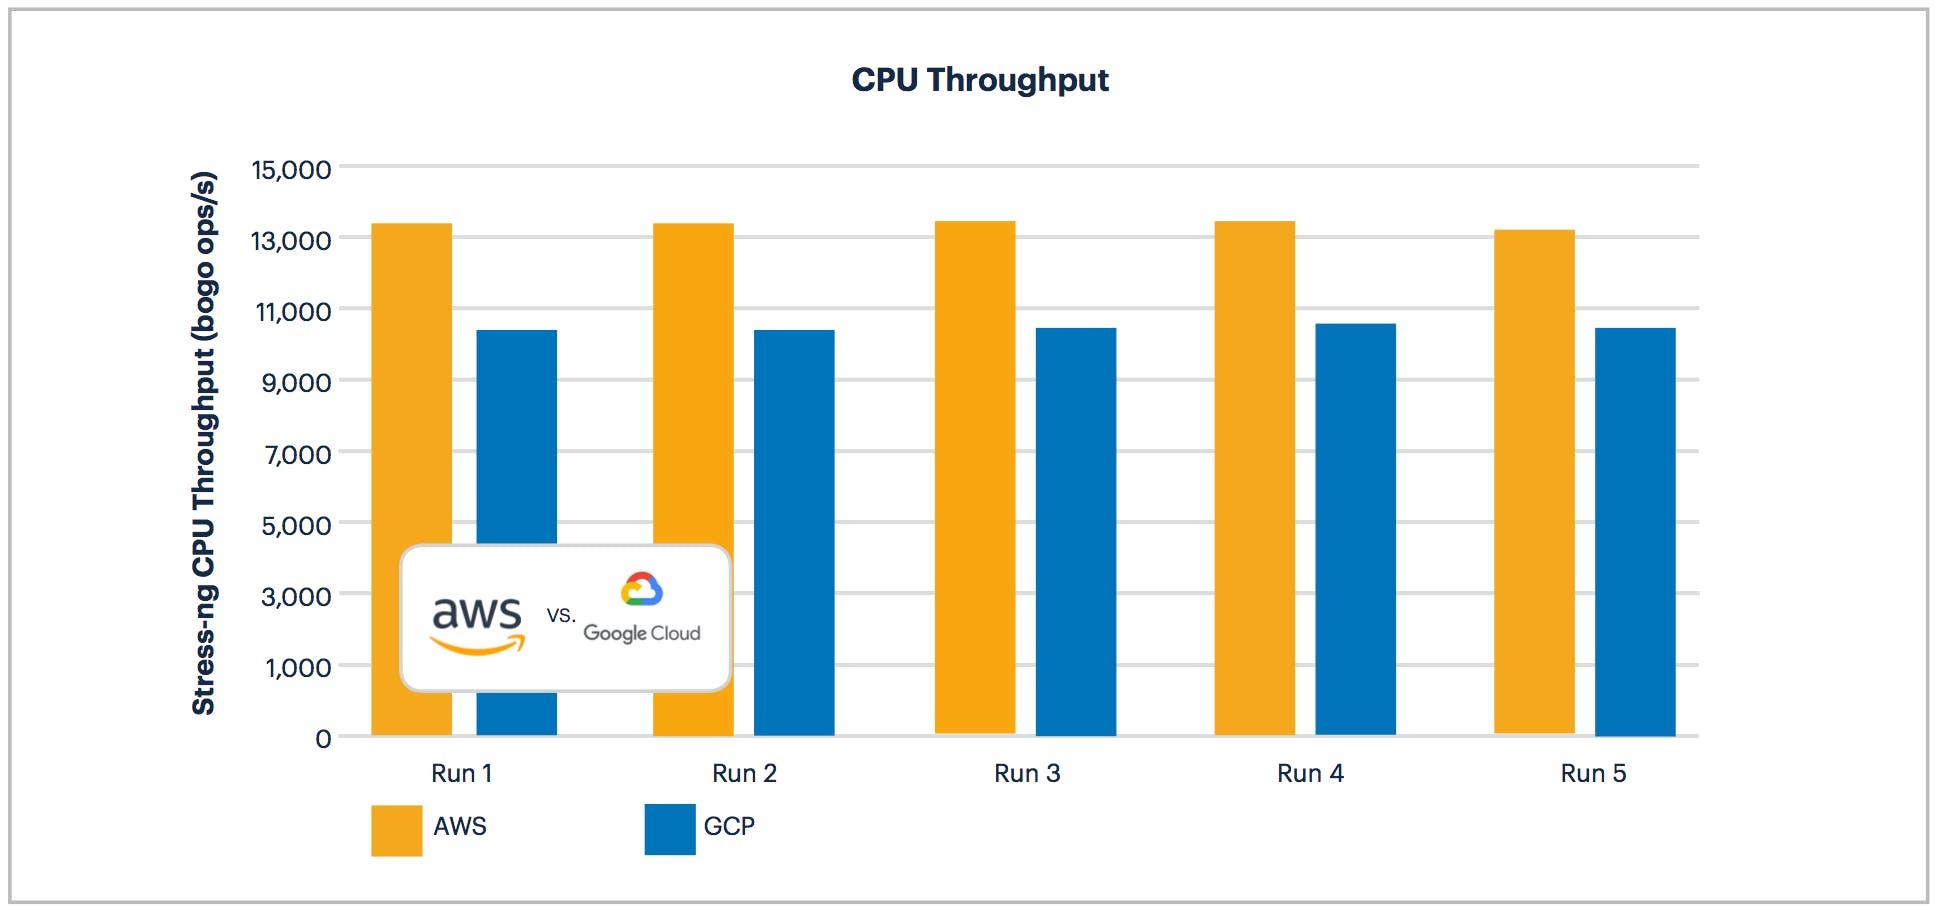 AWS vs GCP: CPU Throughput